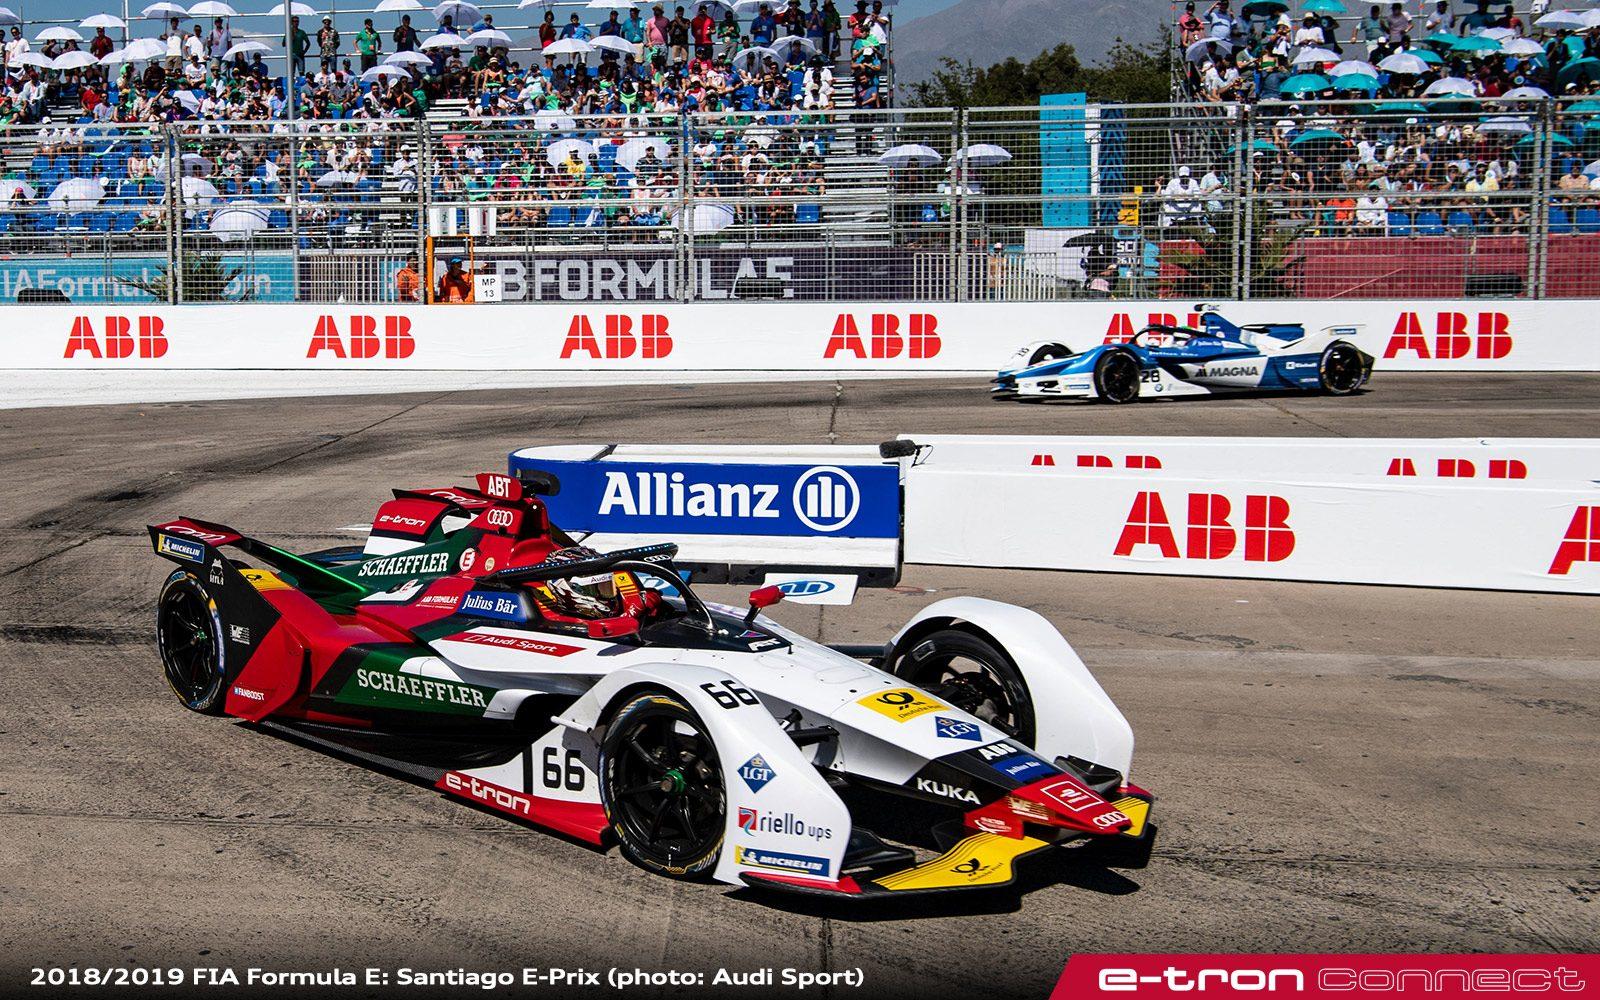 2019 Formula E Santiago 515